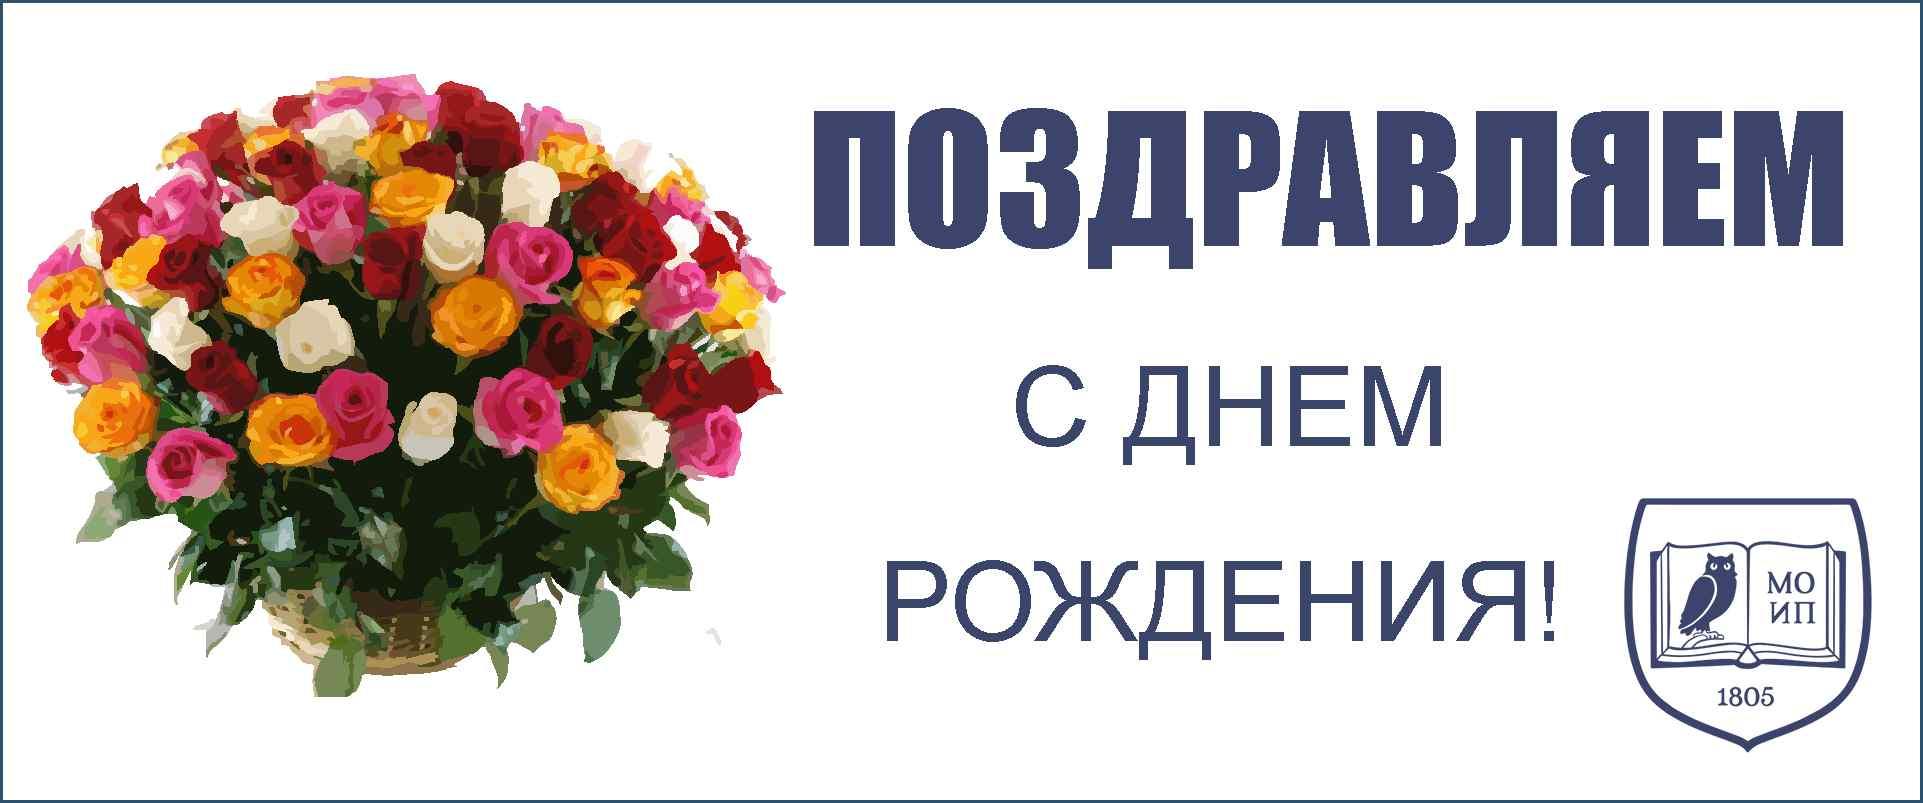 Шалве Александровичу АМОНАШВИЛИ - 90 лет!